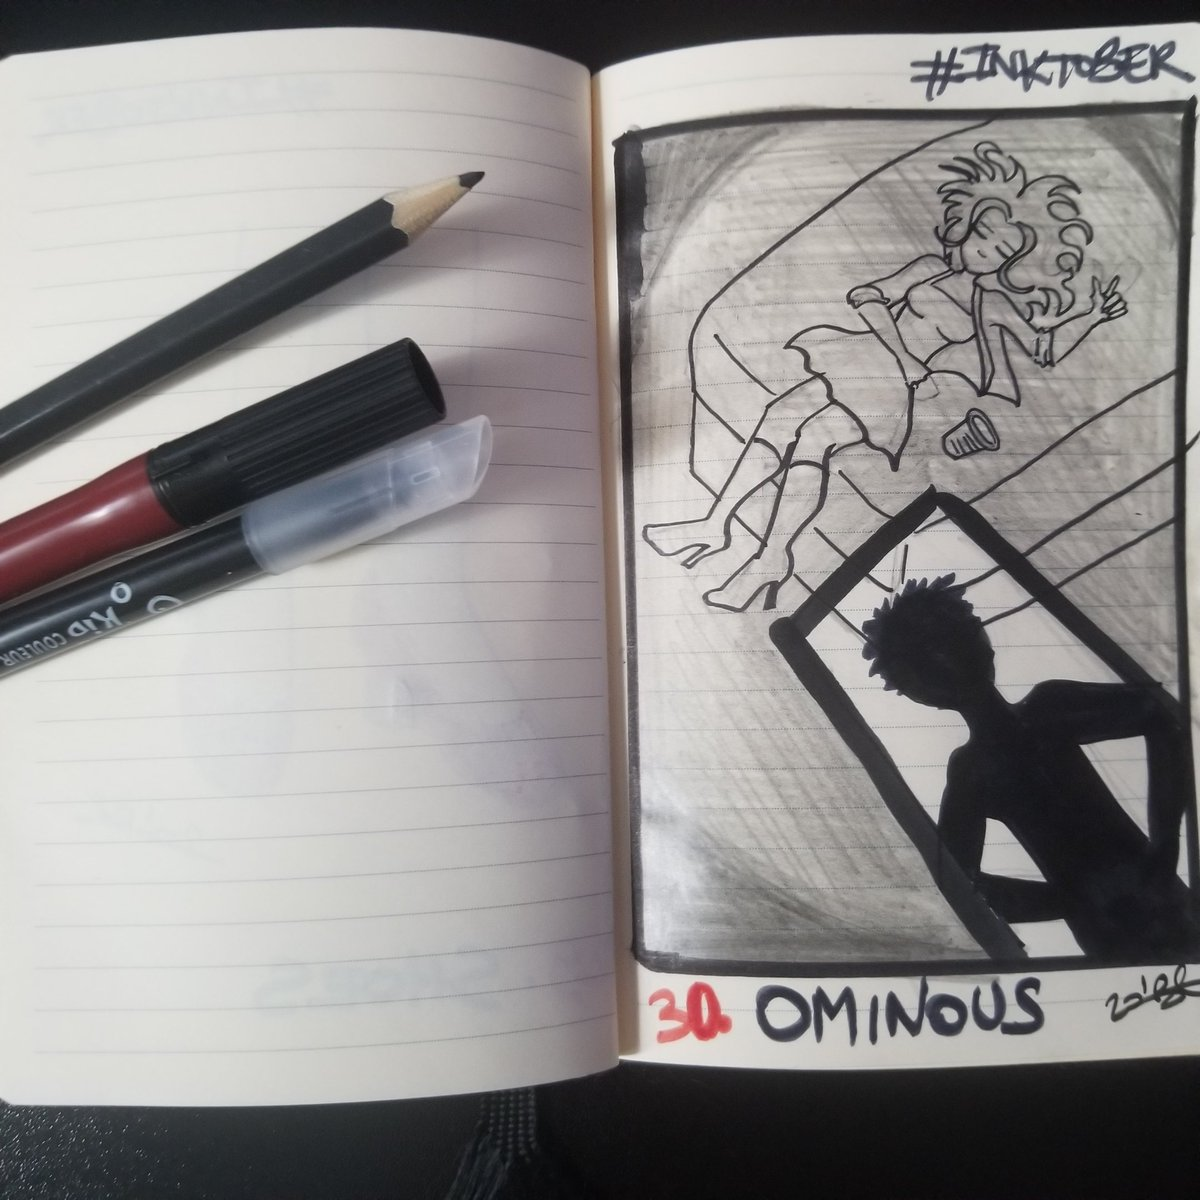 Jour 30 #ominous #demauvaiseaugure #danger #predateur #inktober2020 #inktober #inktoberfish #inktoberfish2020 #noiretblanc #blackandwhite  #doodle #ink #drawing #fineliner #sketch #inksketch #pen #pensketch  #penart #sketching #illustration  #inking #inkwork #axelleb34 https://t.co/xYMyo9cUFI